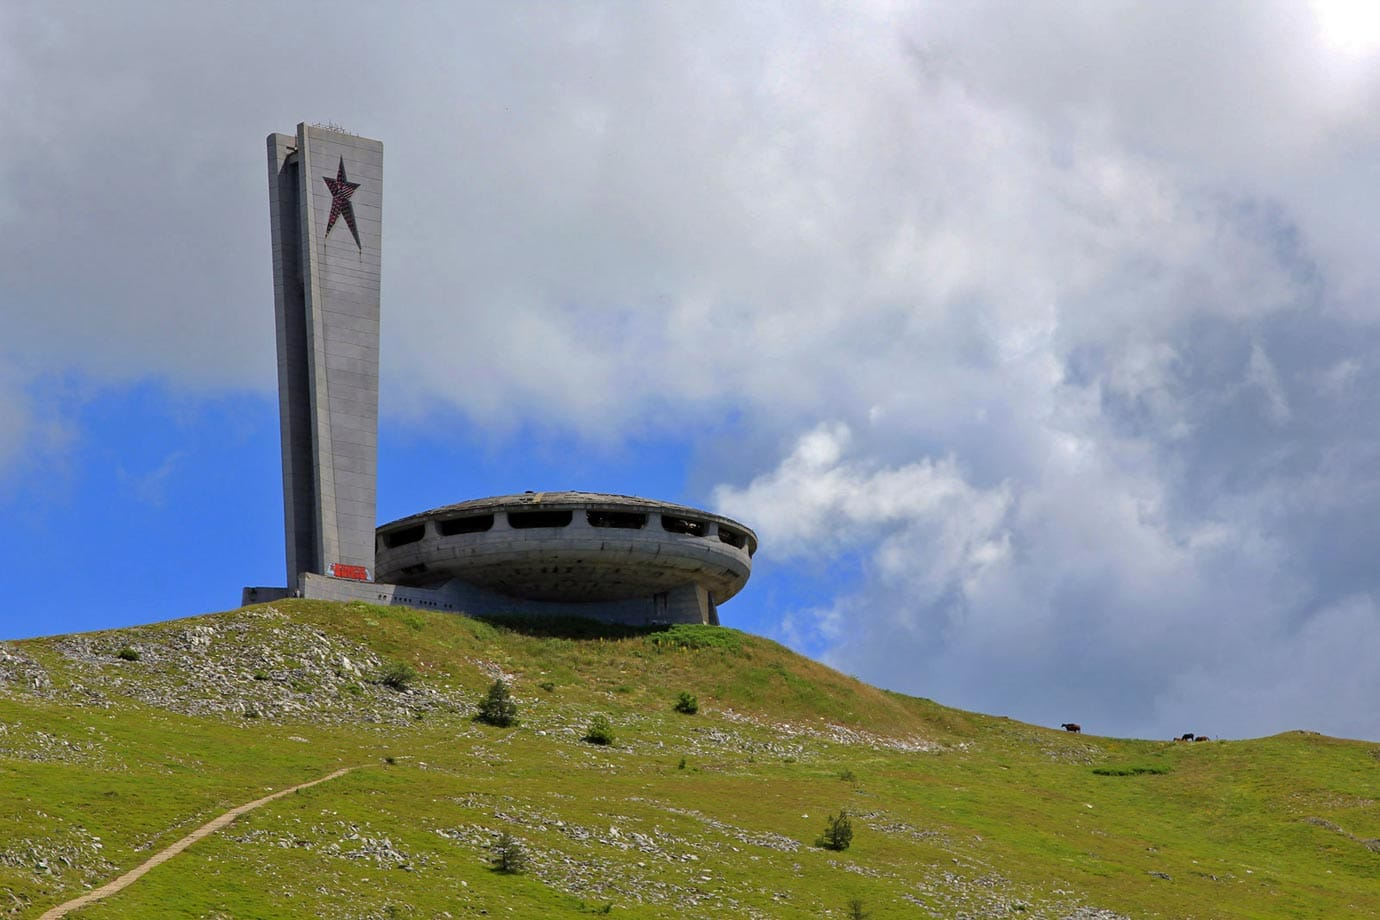 Do you think Buzludzha looks like a flying saucer?